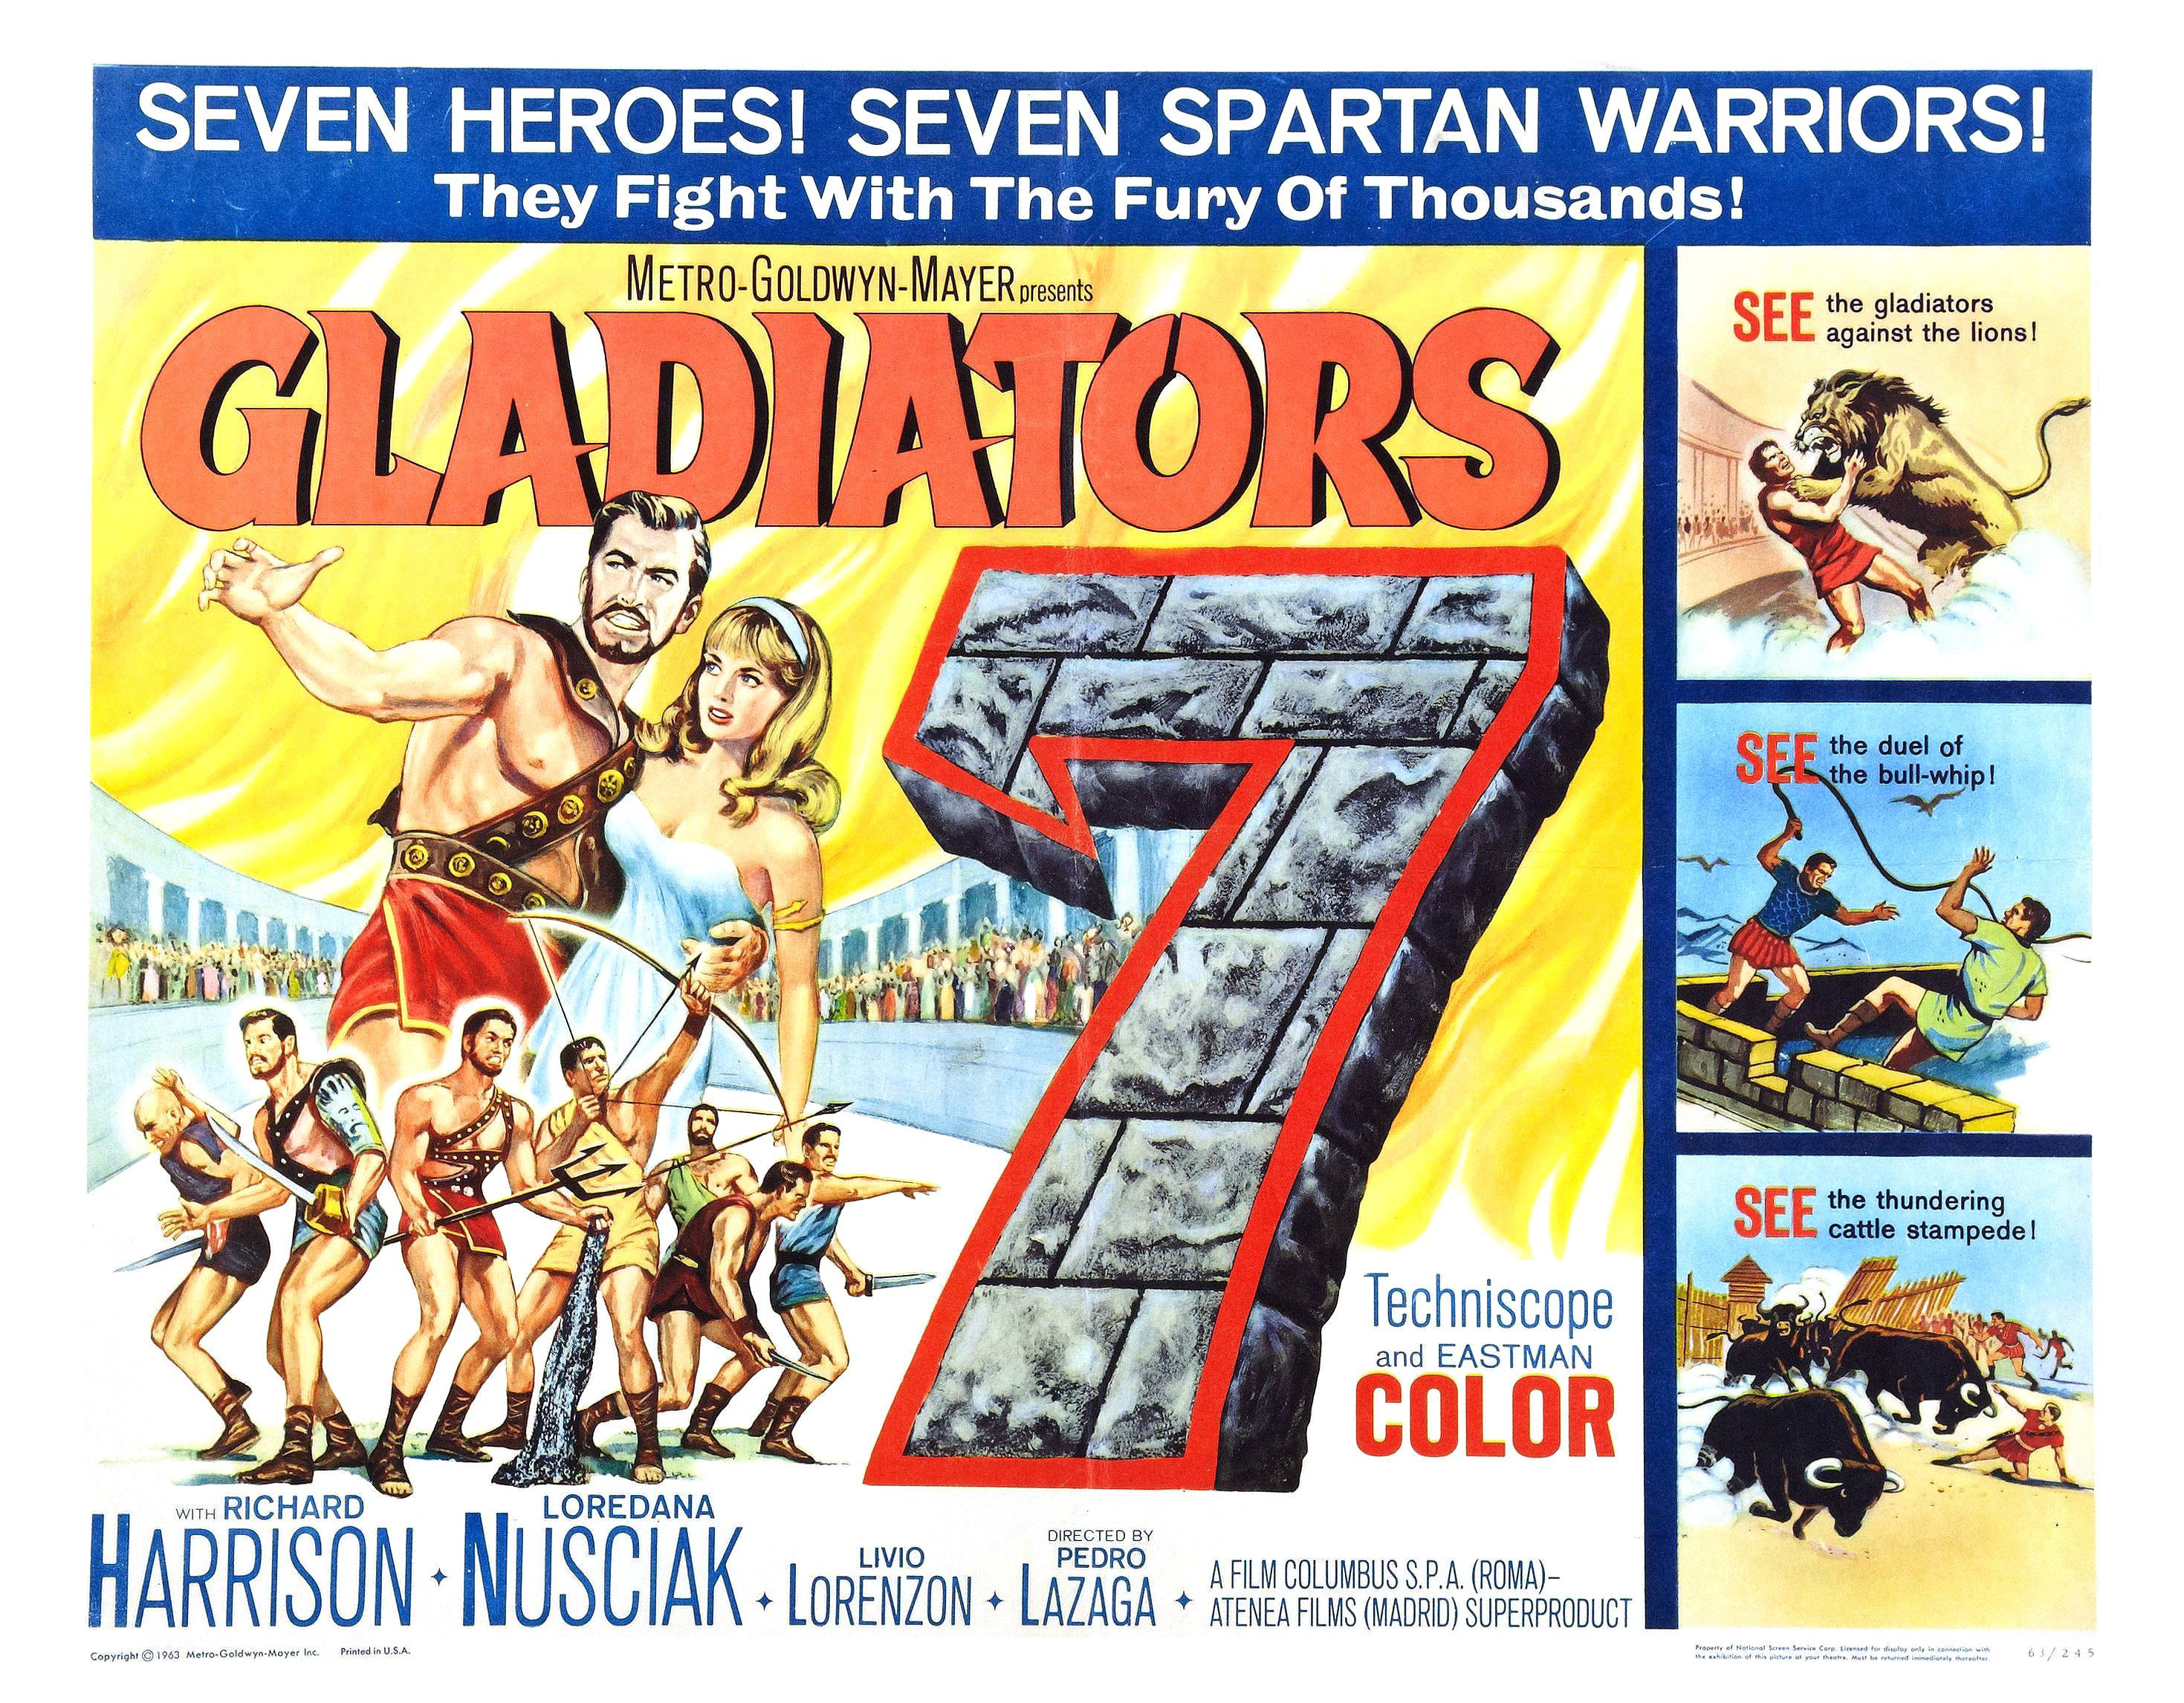 Gladiators 7 (1962)